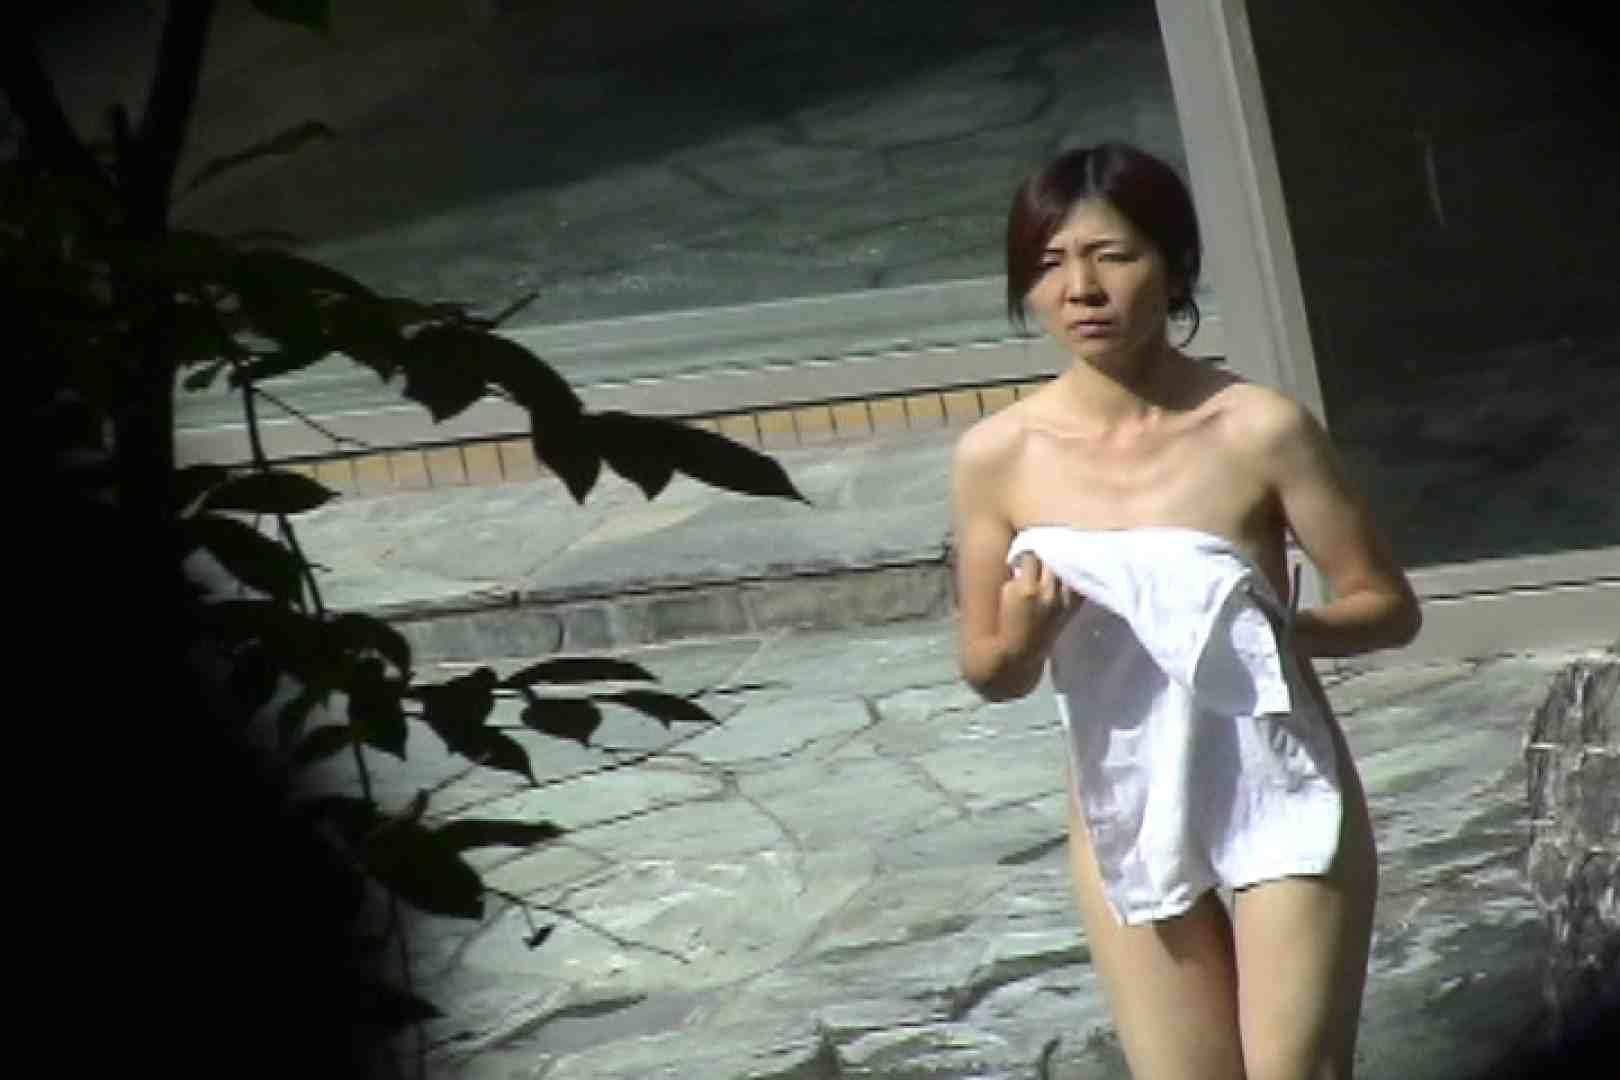 Aquaな露天風呂Vol.449 エッチな盗撮   0  93pic 37